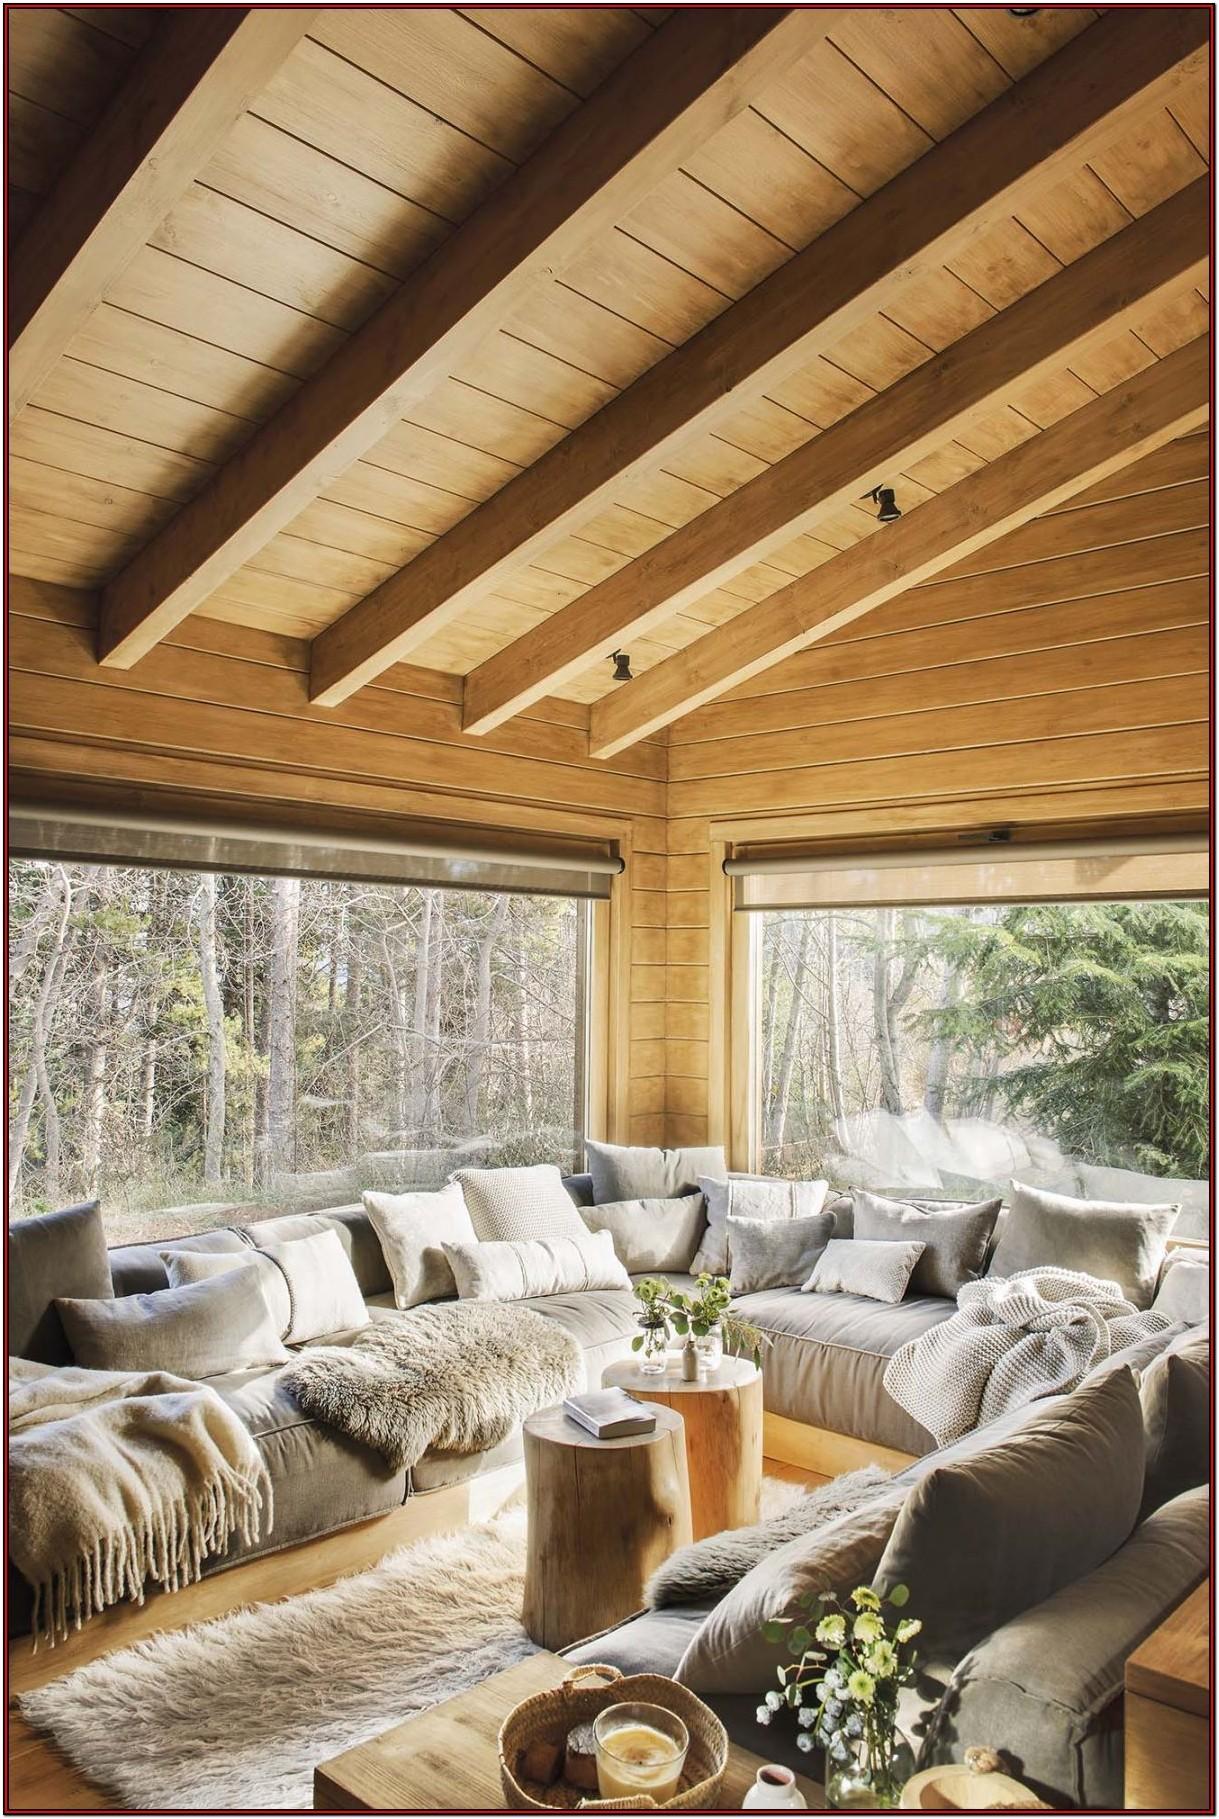 Rustic Cabin Living Room Decor